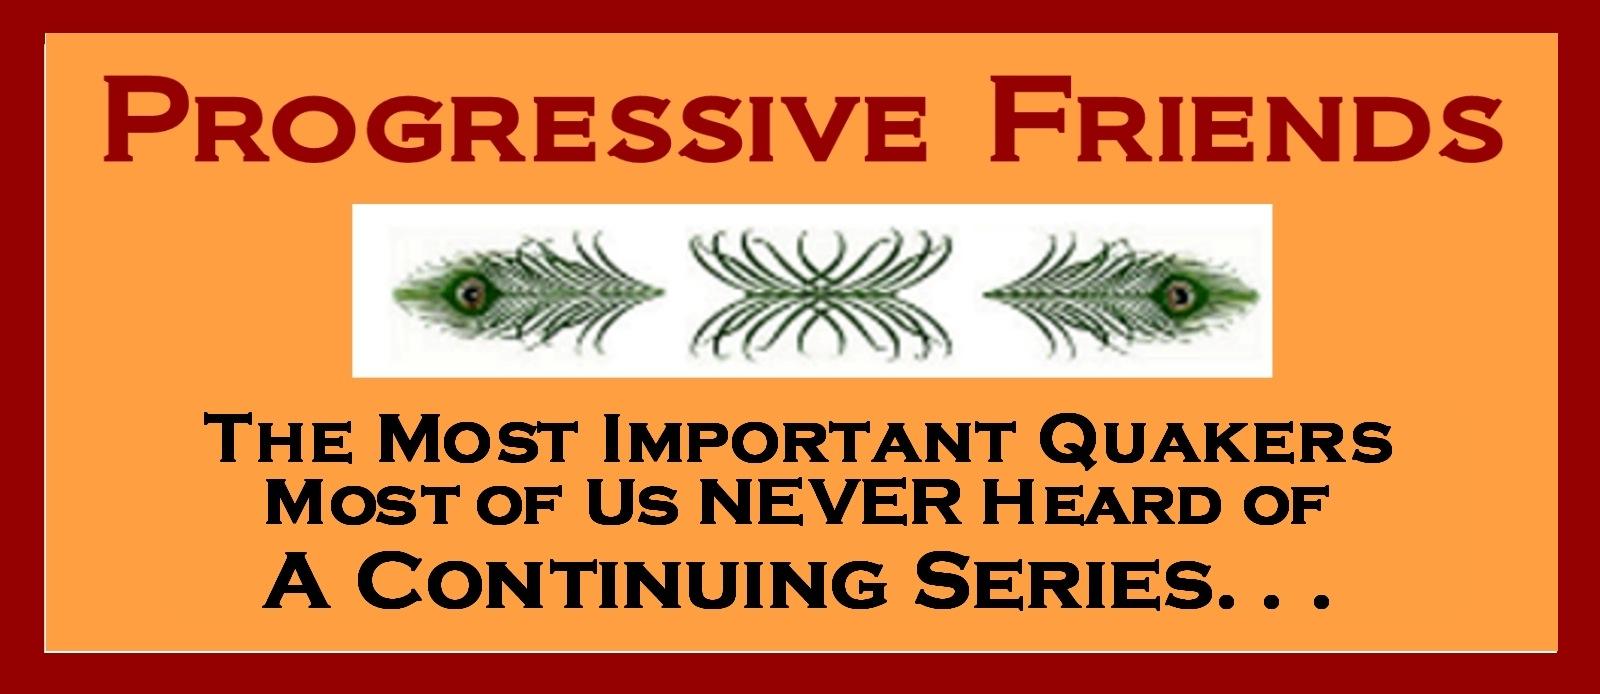 Progressive Friends - A Continuing Series